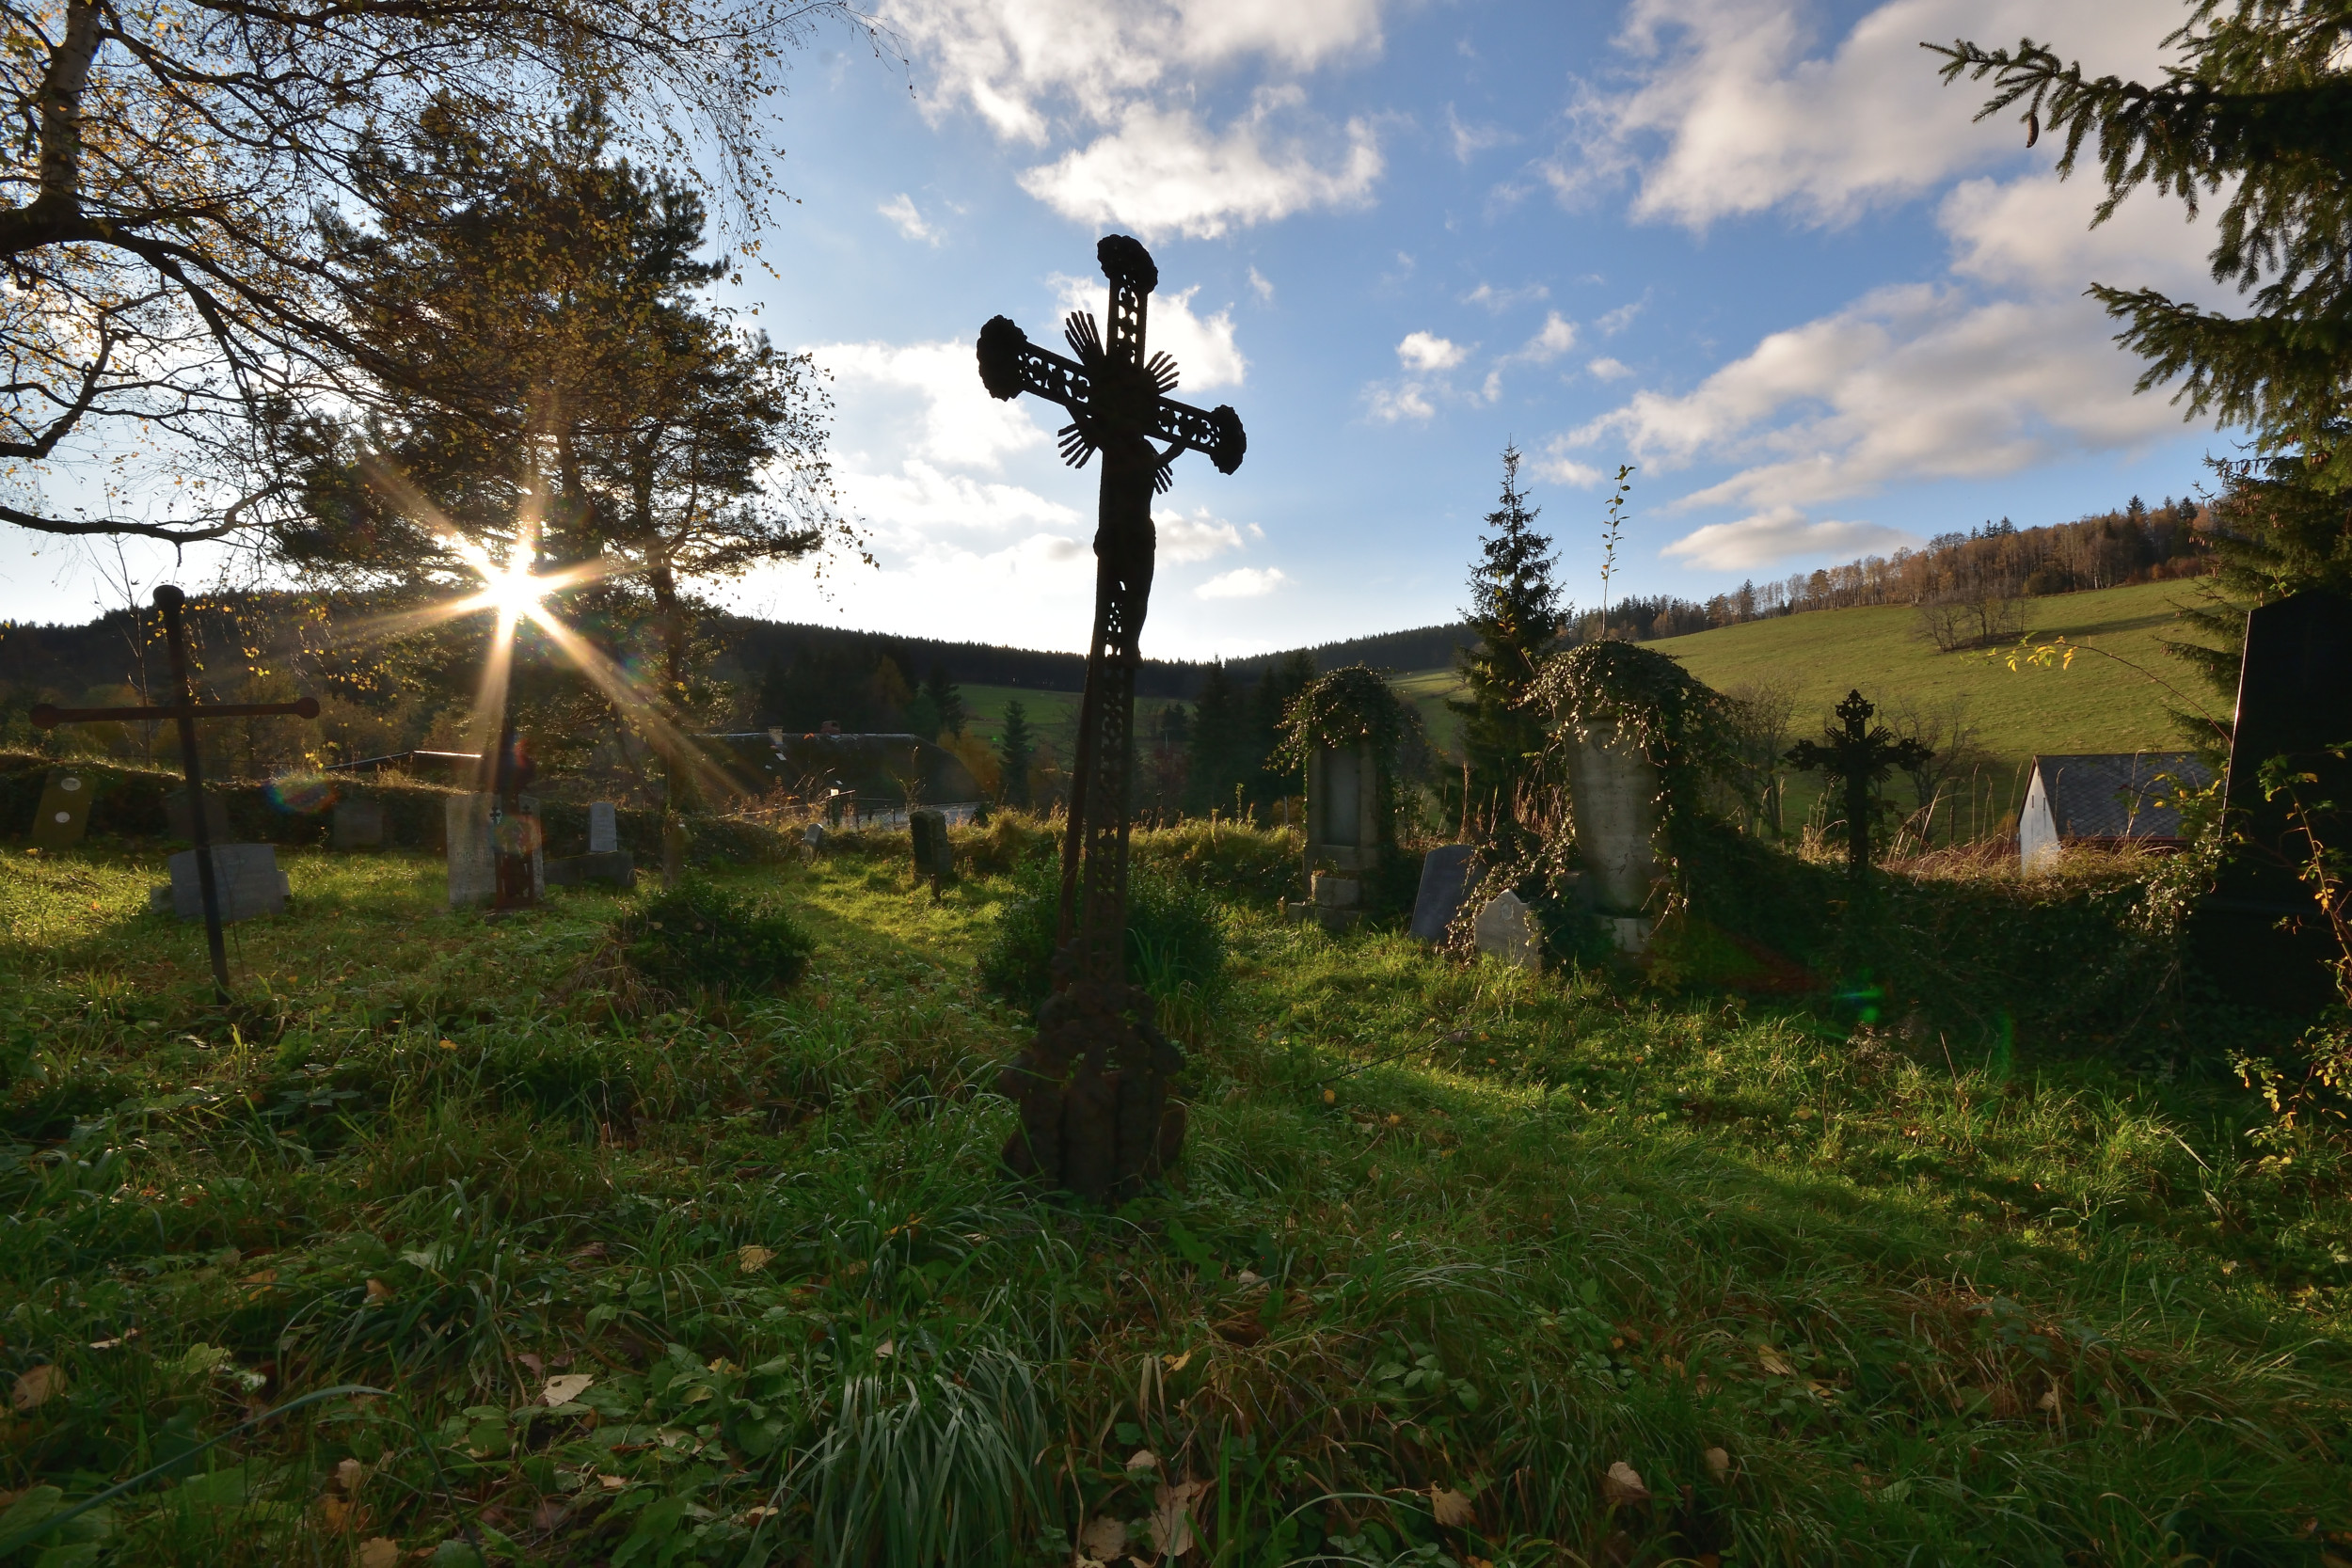 Zálesí hřbitov